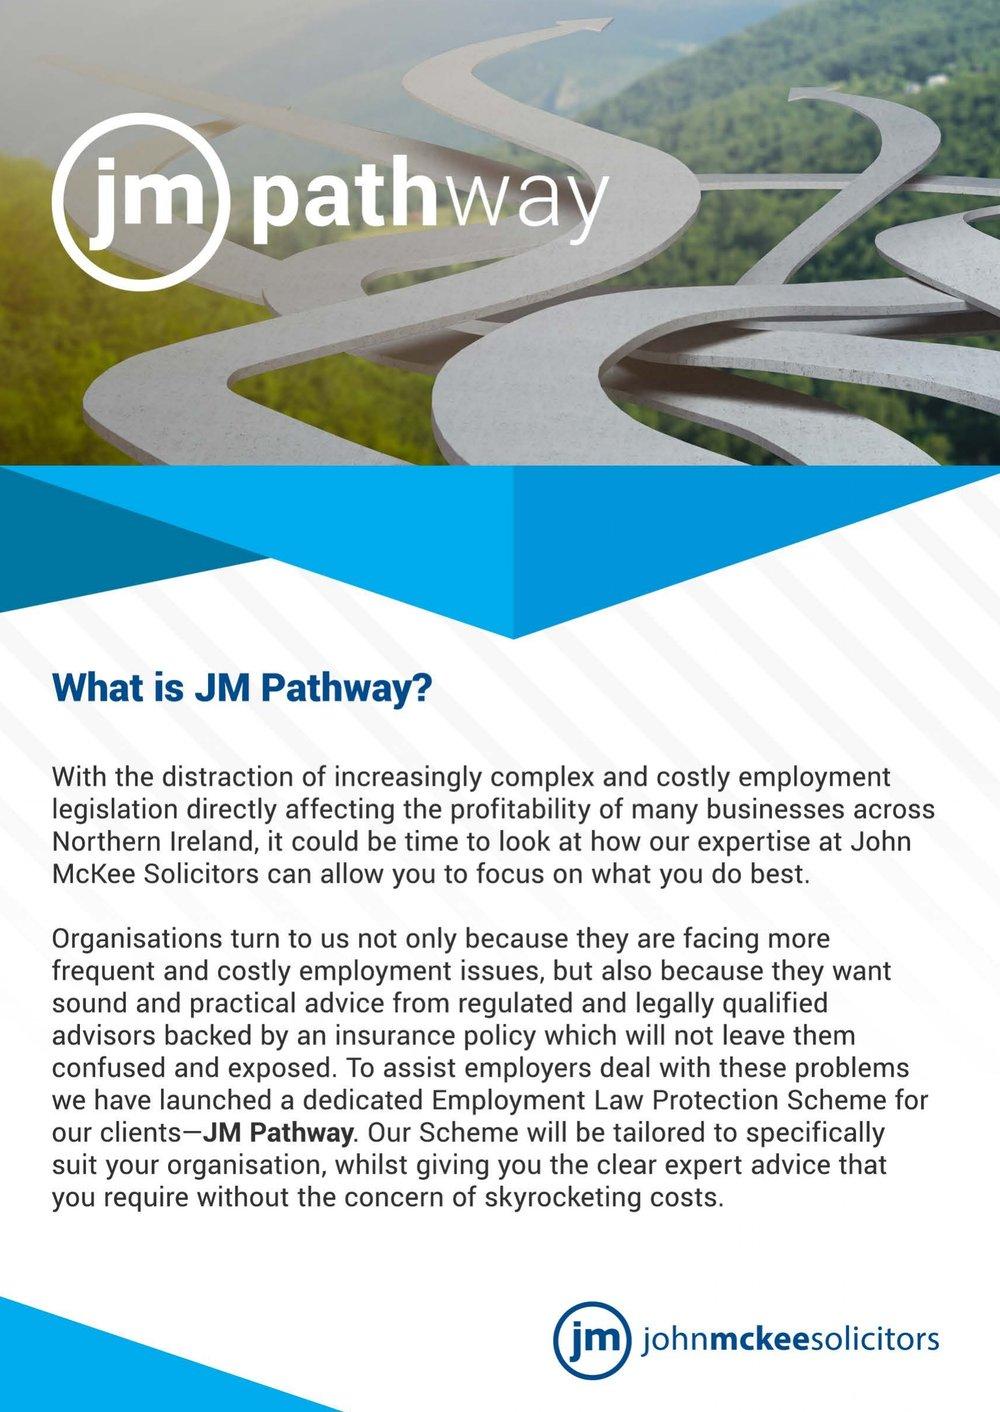 JMPathway Leaflet_Page_1.jpg